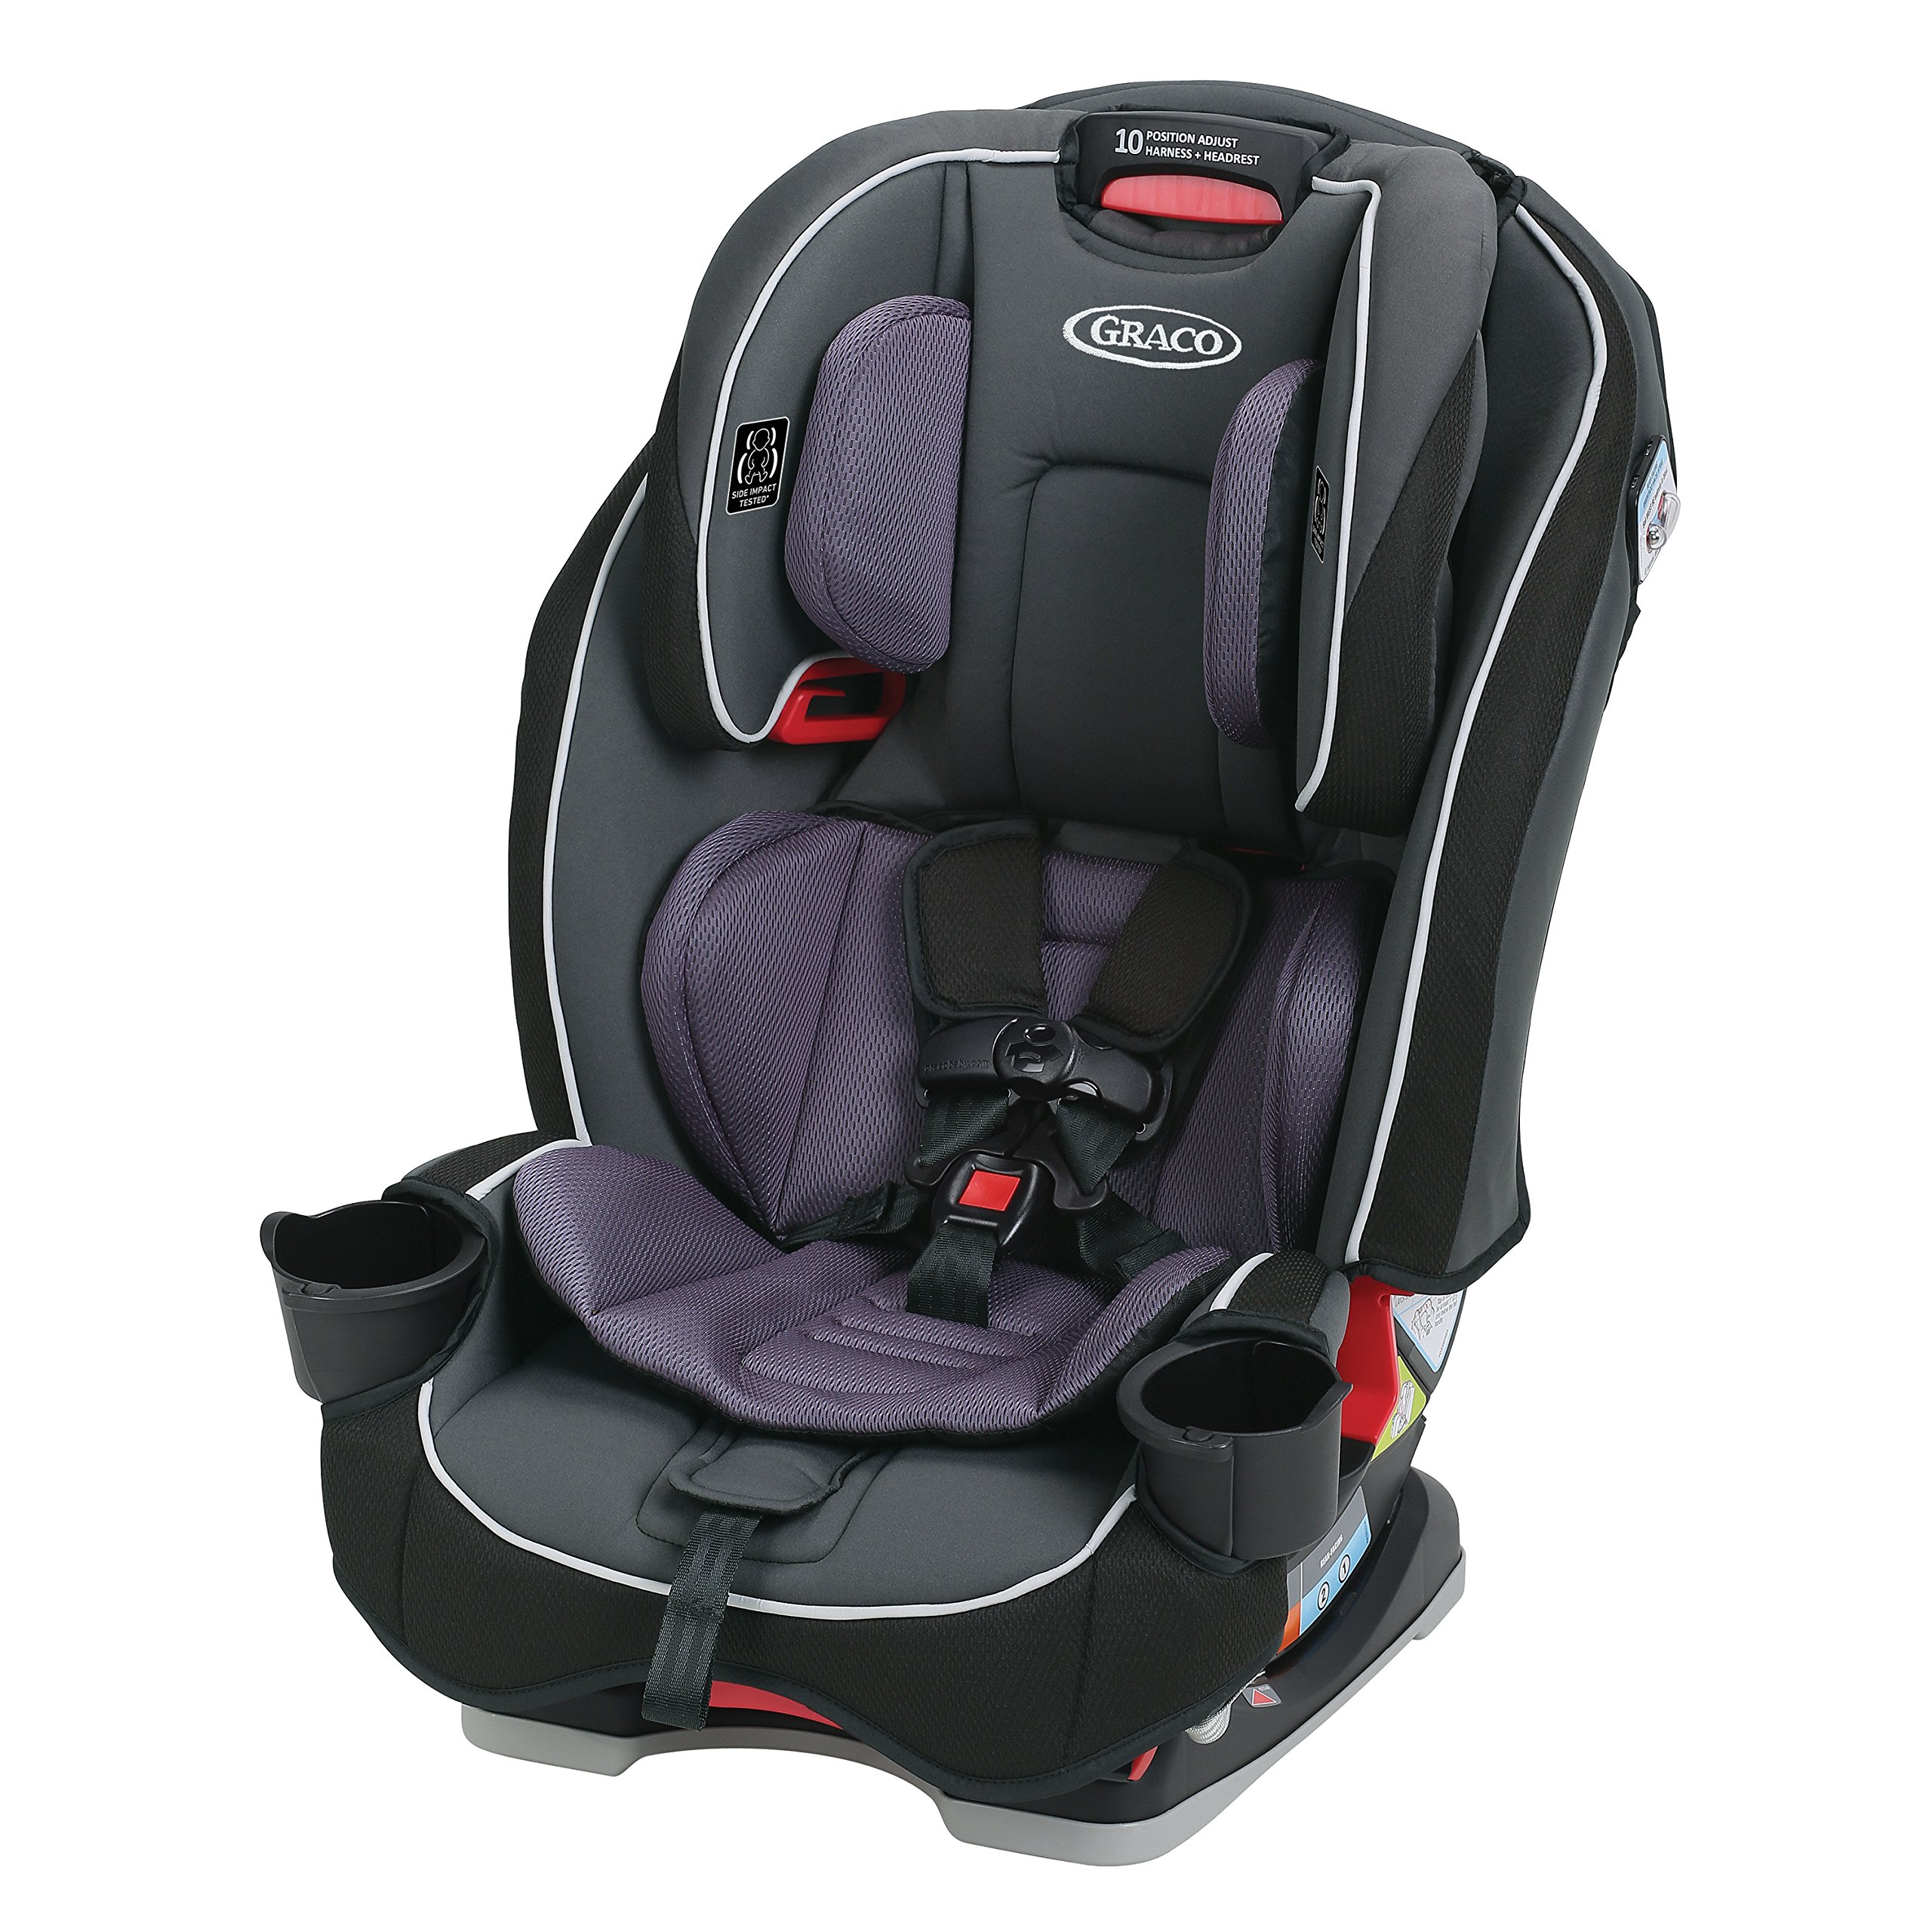 Amazon.com : Graco SlimFit 3-in-1 Convertible Car Seat